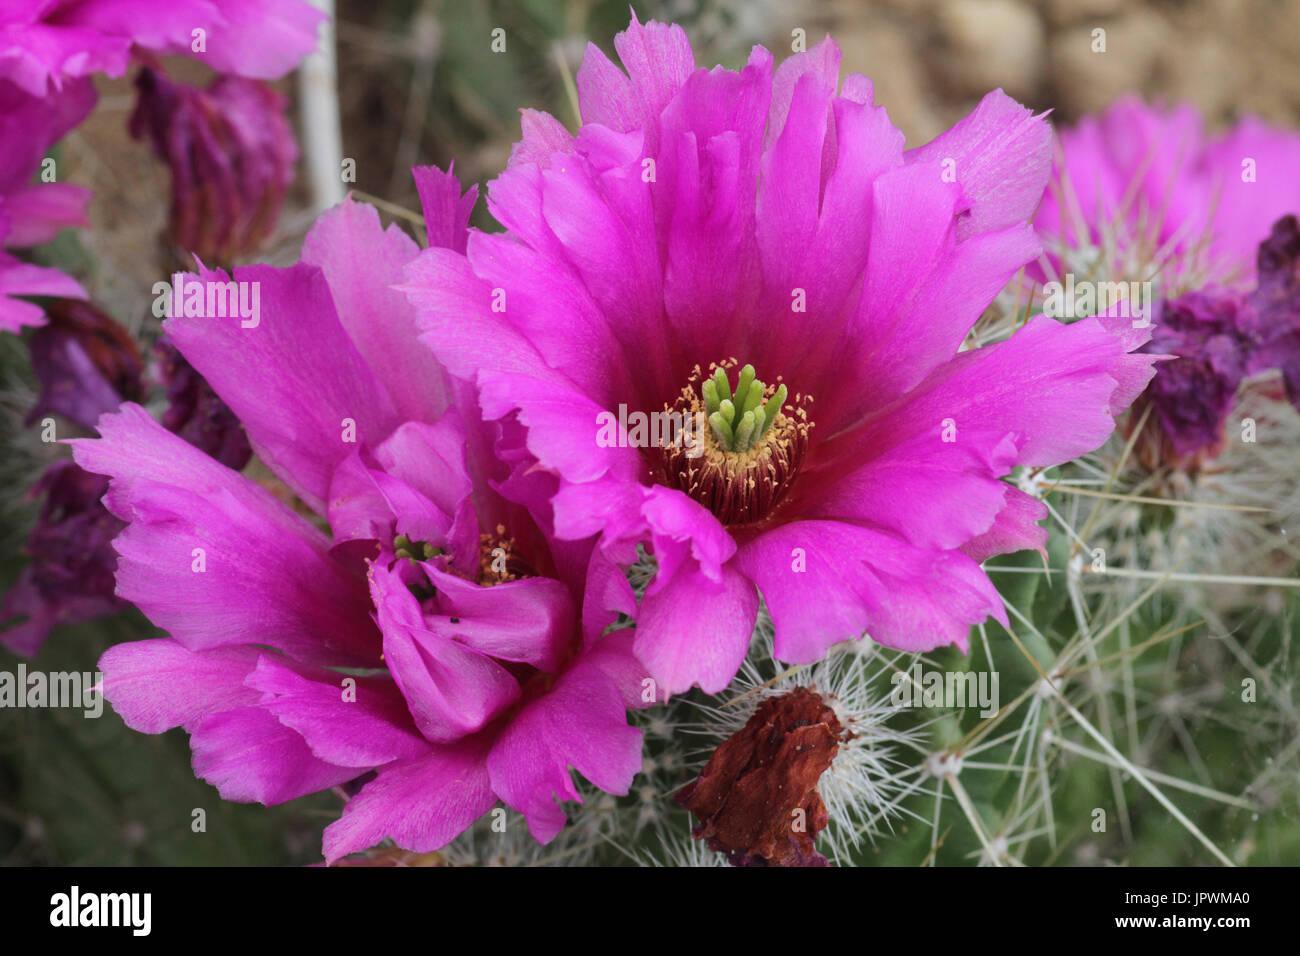 Enneacanthus stock photos enneacanthus stock images alamy for Zierfische barsch